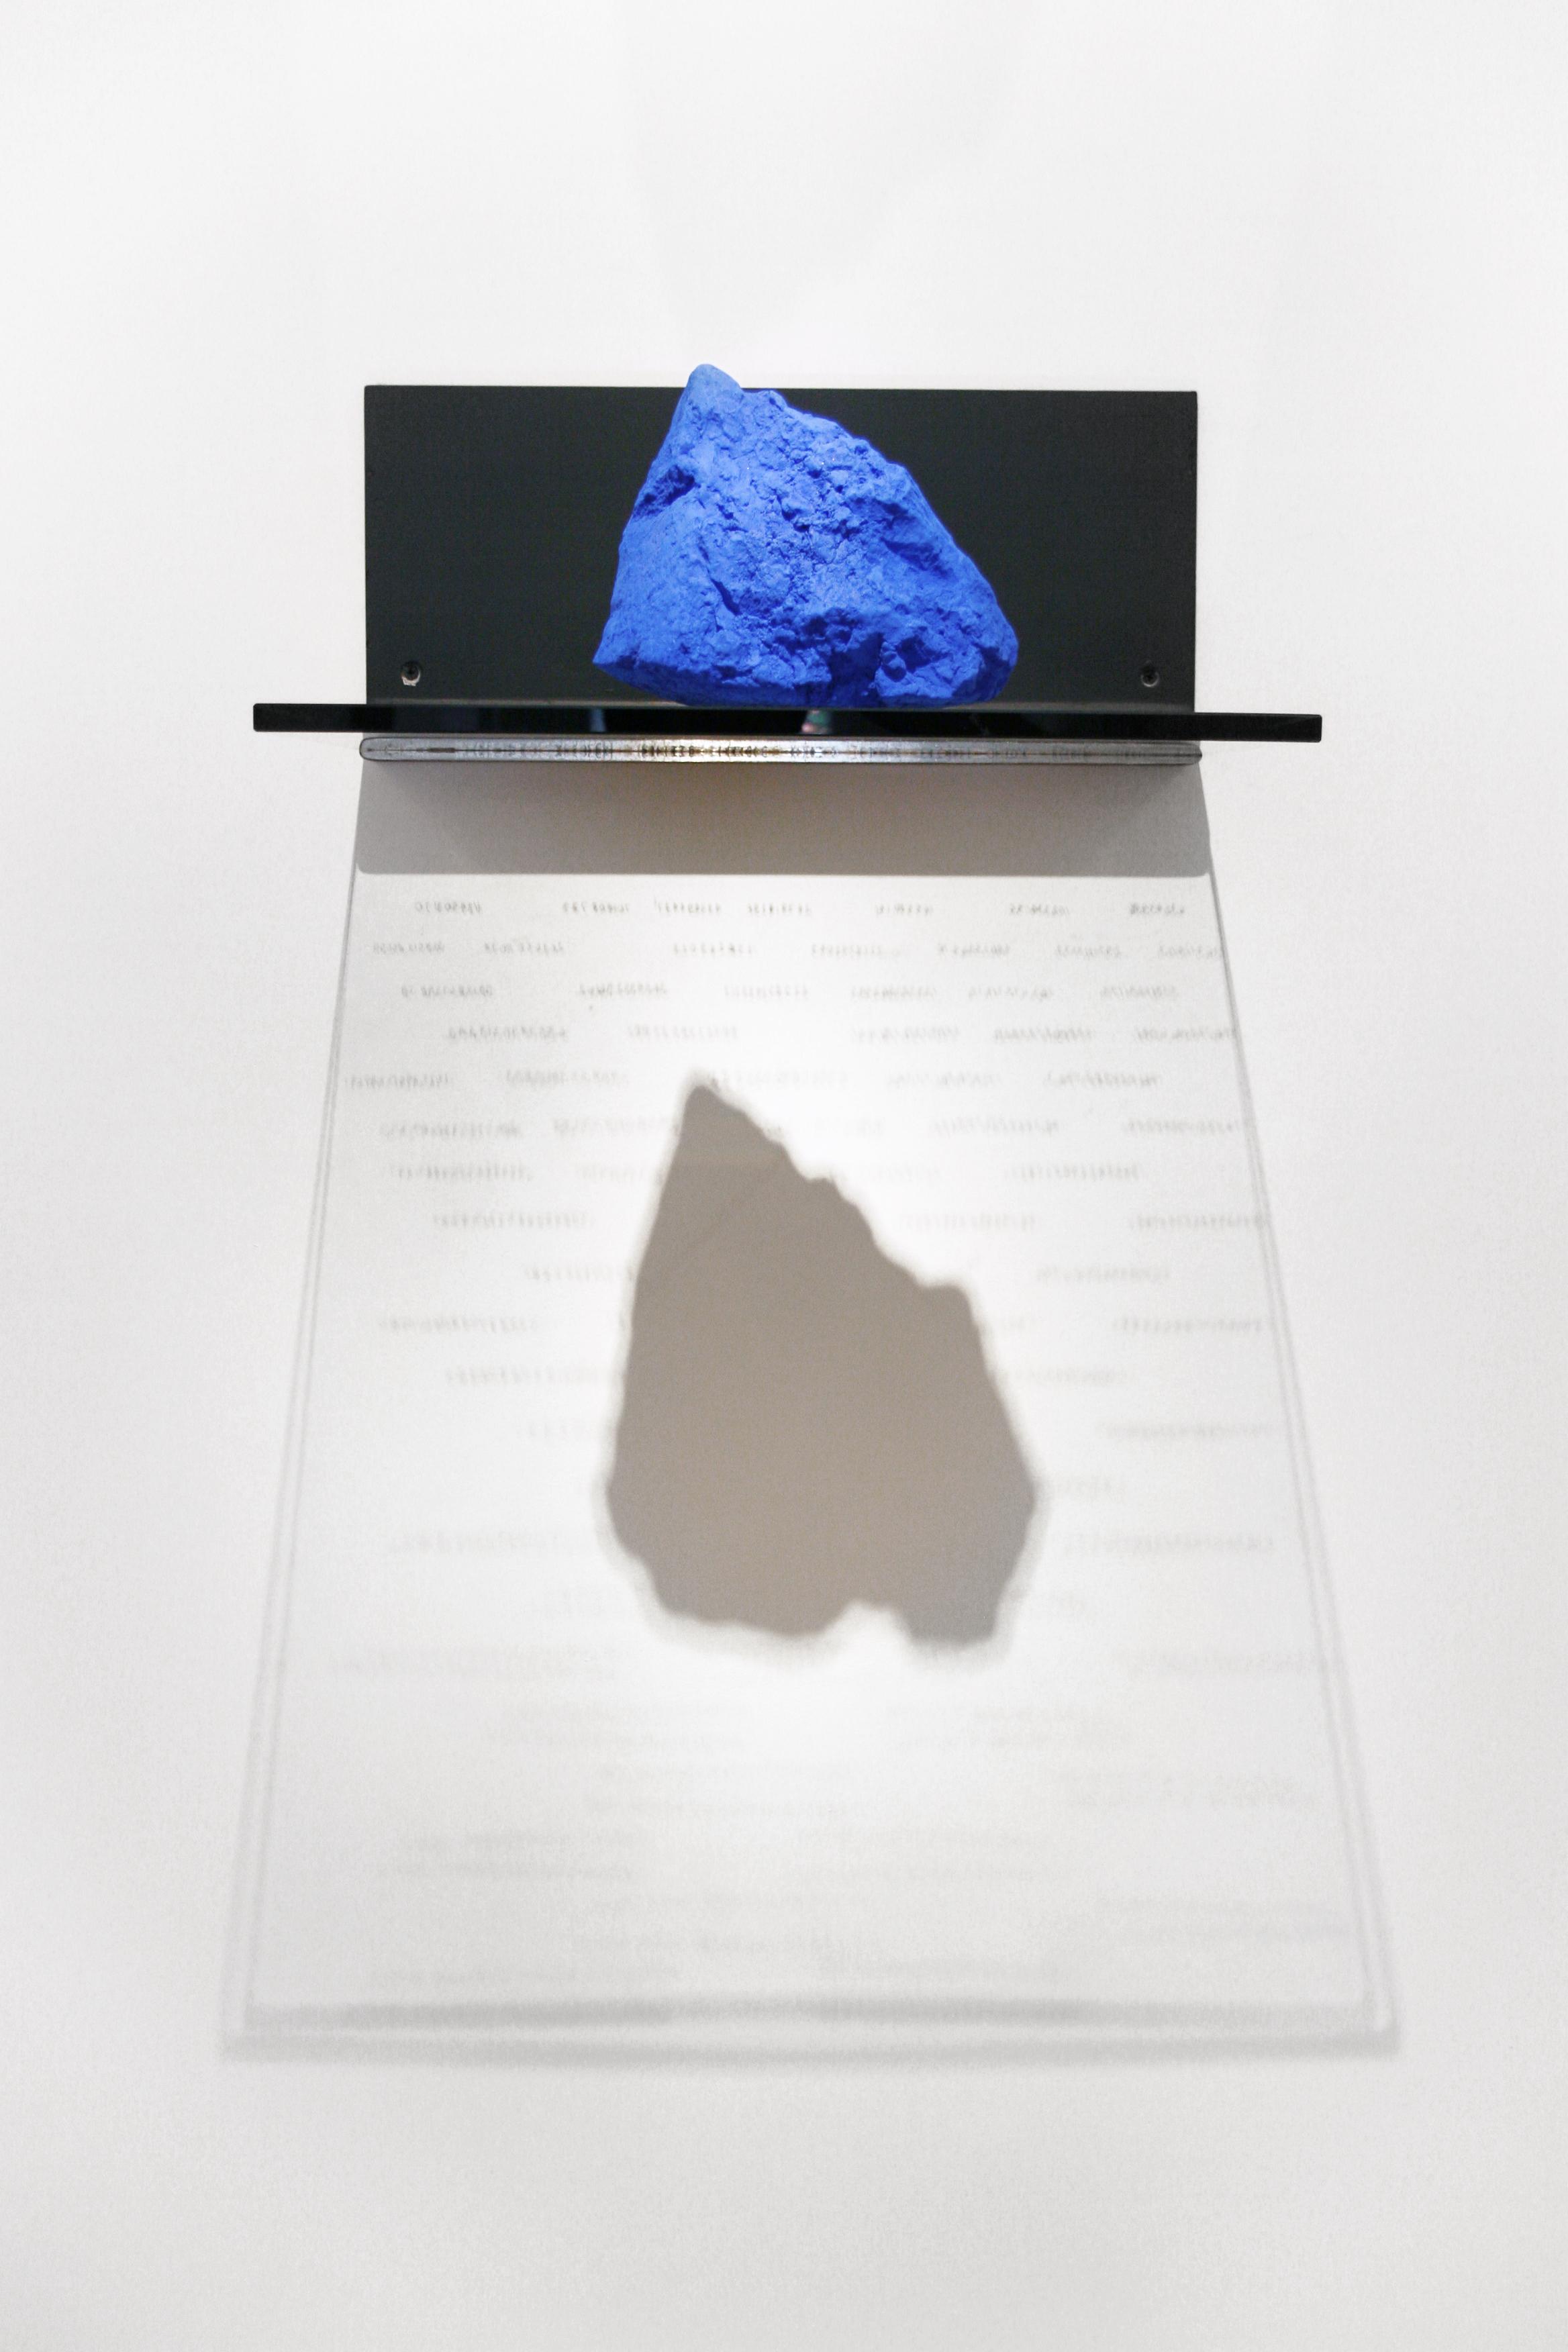 ULTRAMARINUS  STEEL, SILKSCREEN ON GLASS, PURE POWDER PIGMENT   18 x 18 x 7 in  INQUIRE